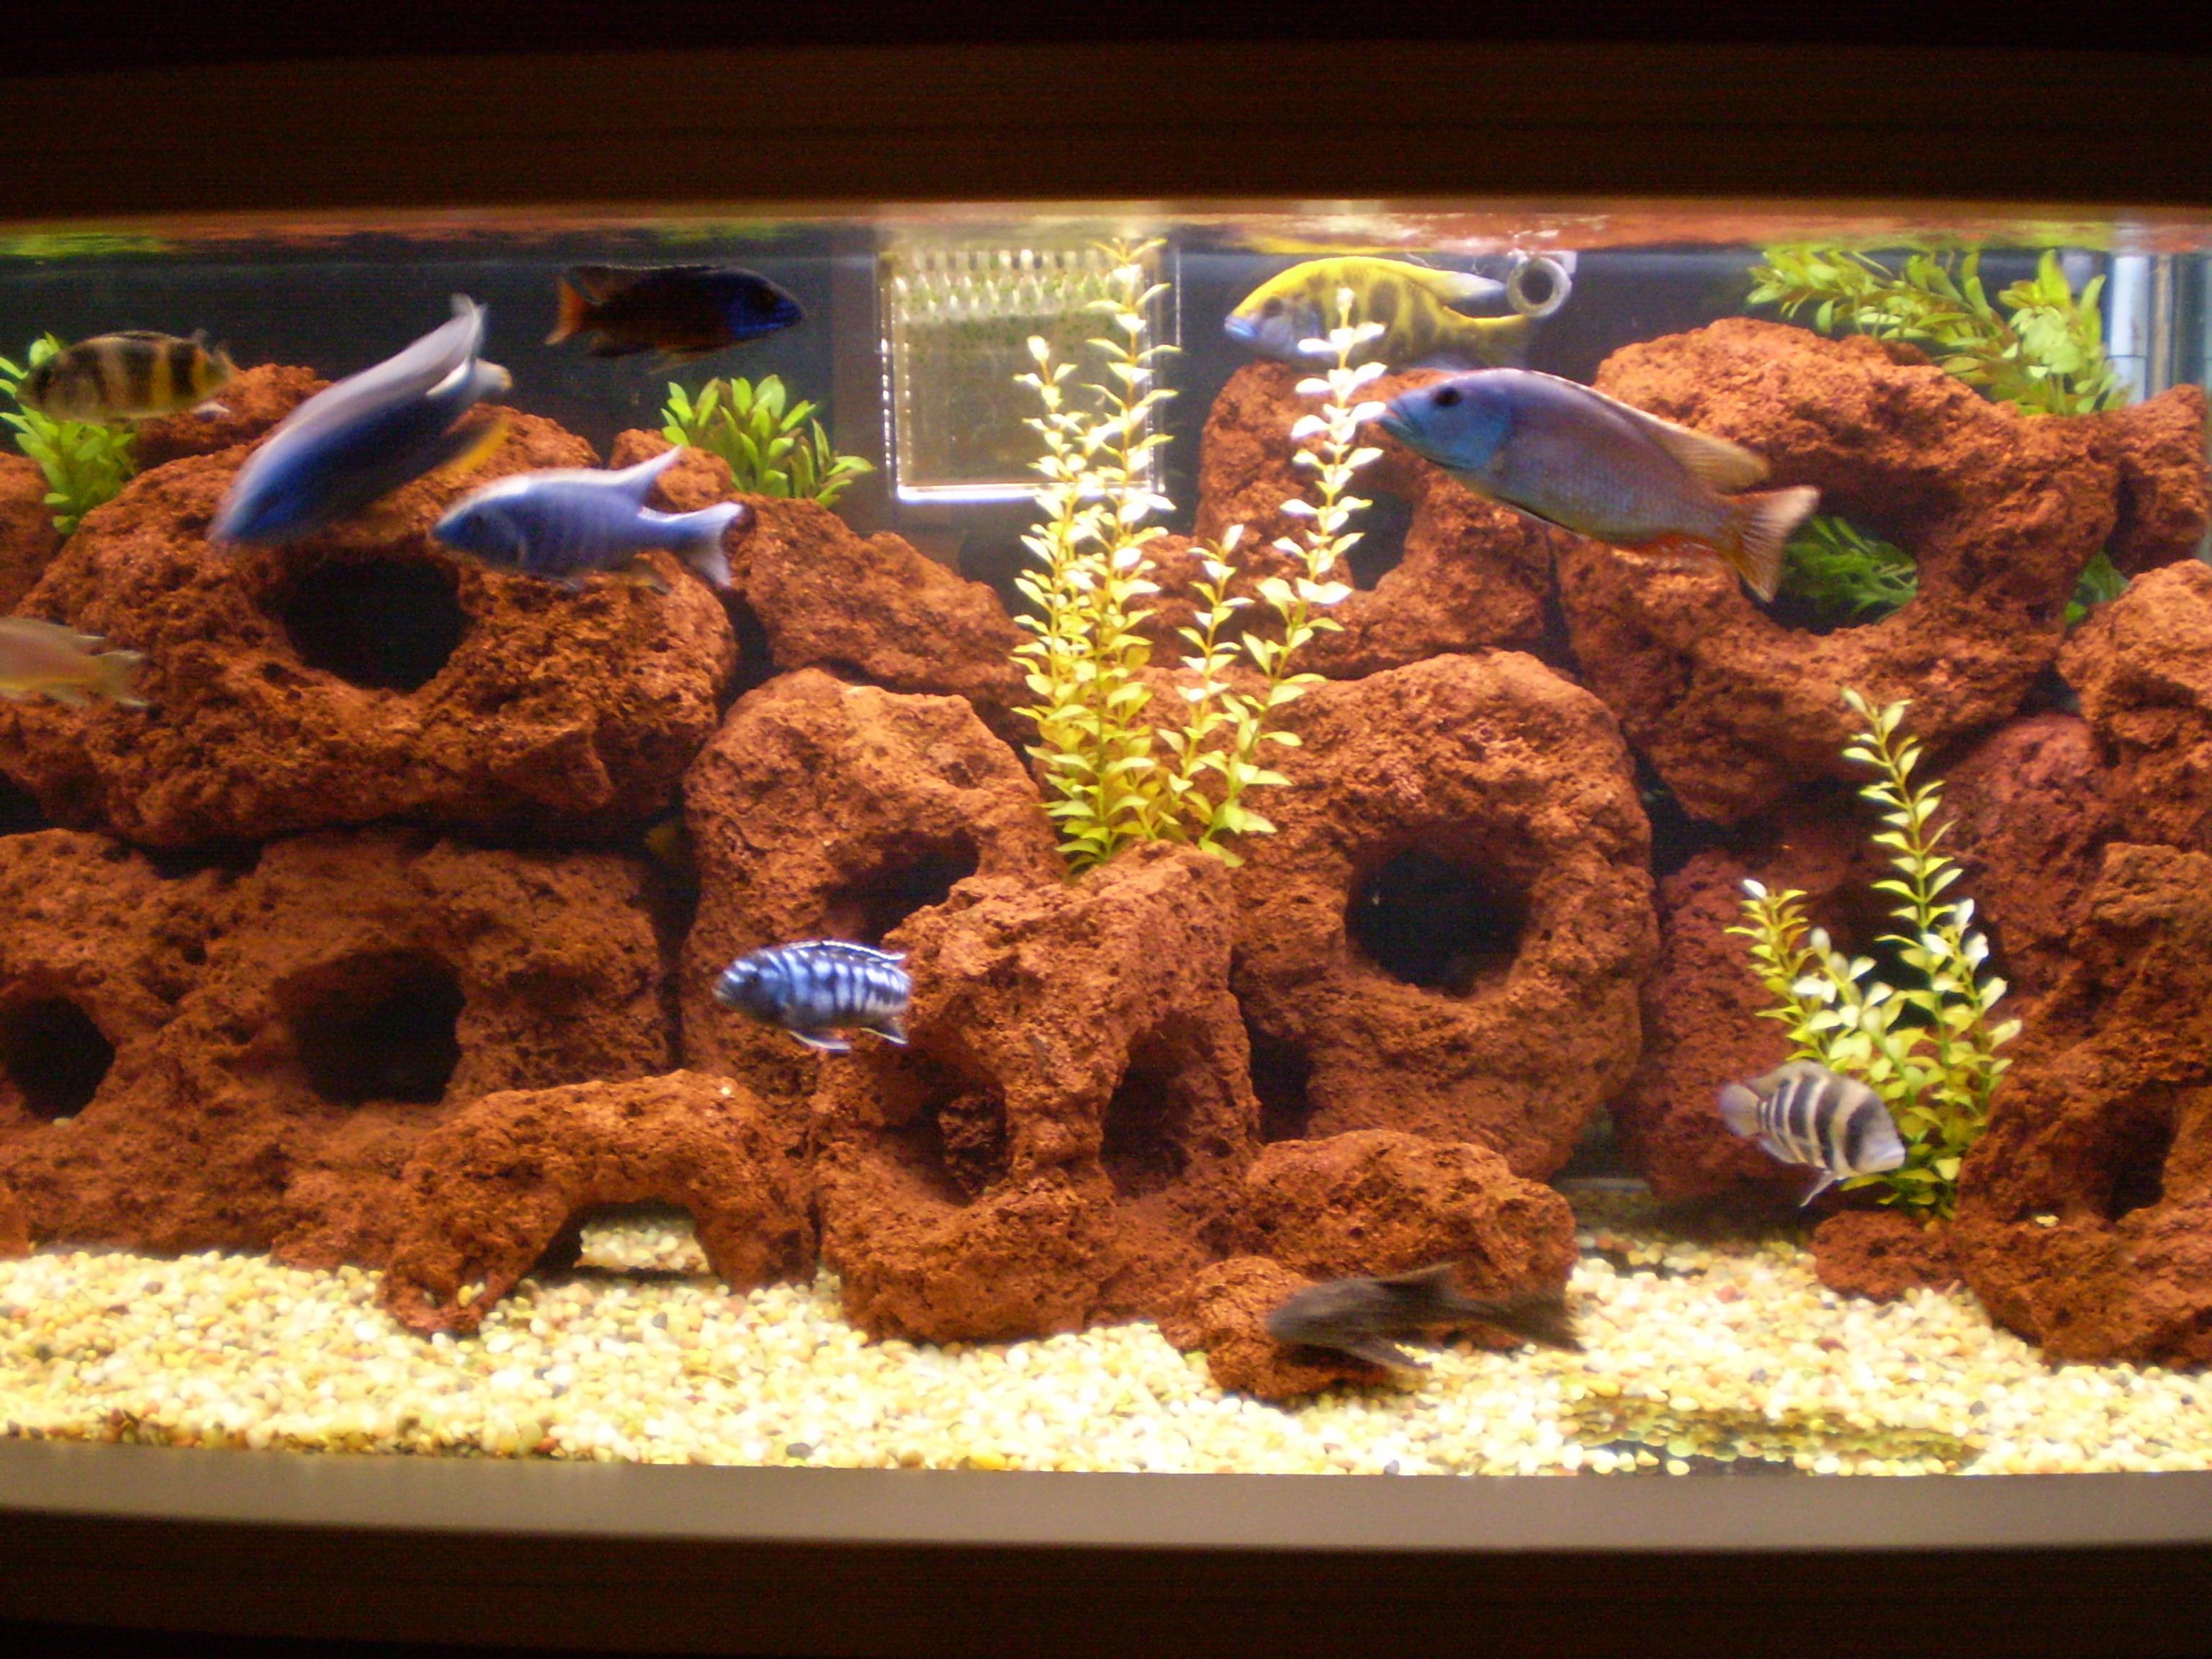 200 gallon tank for sale for 200 gallon fish tank for sale